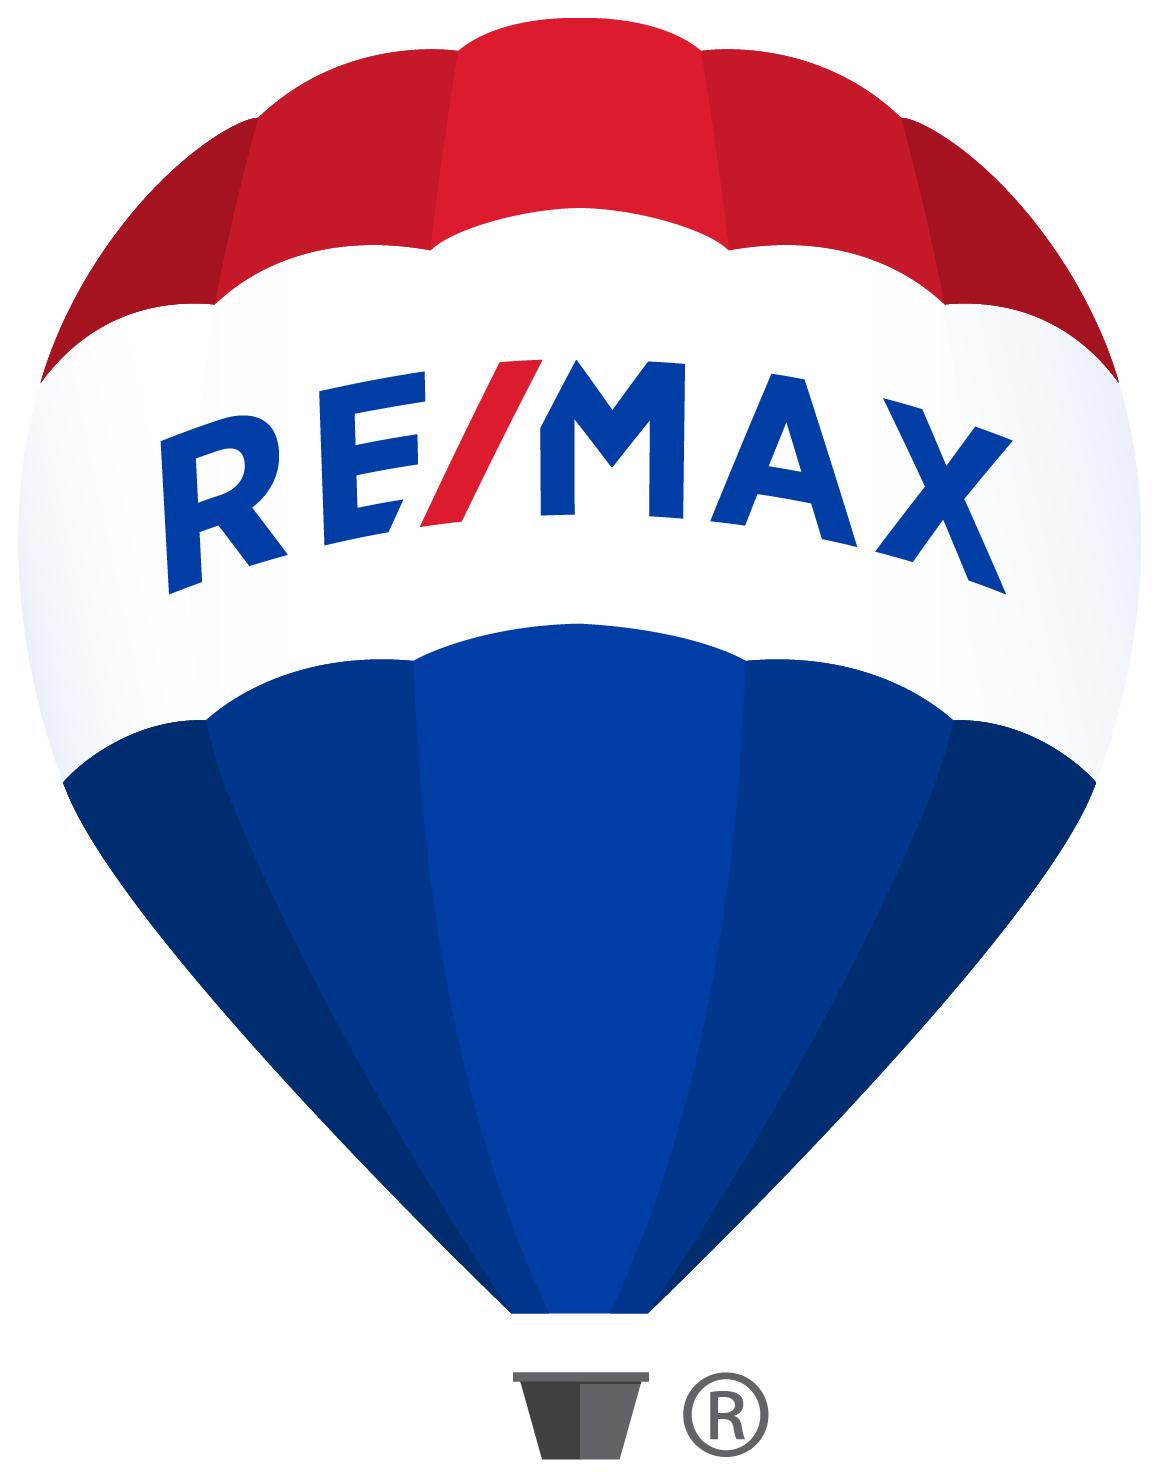 Remax Estate Properties